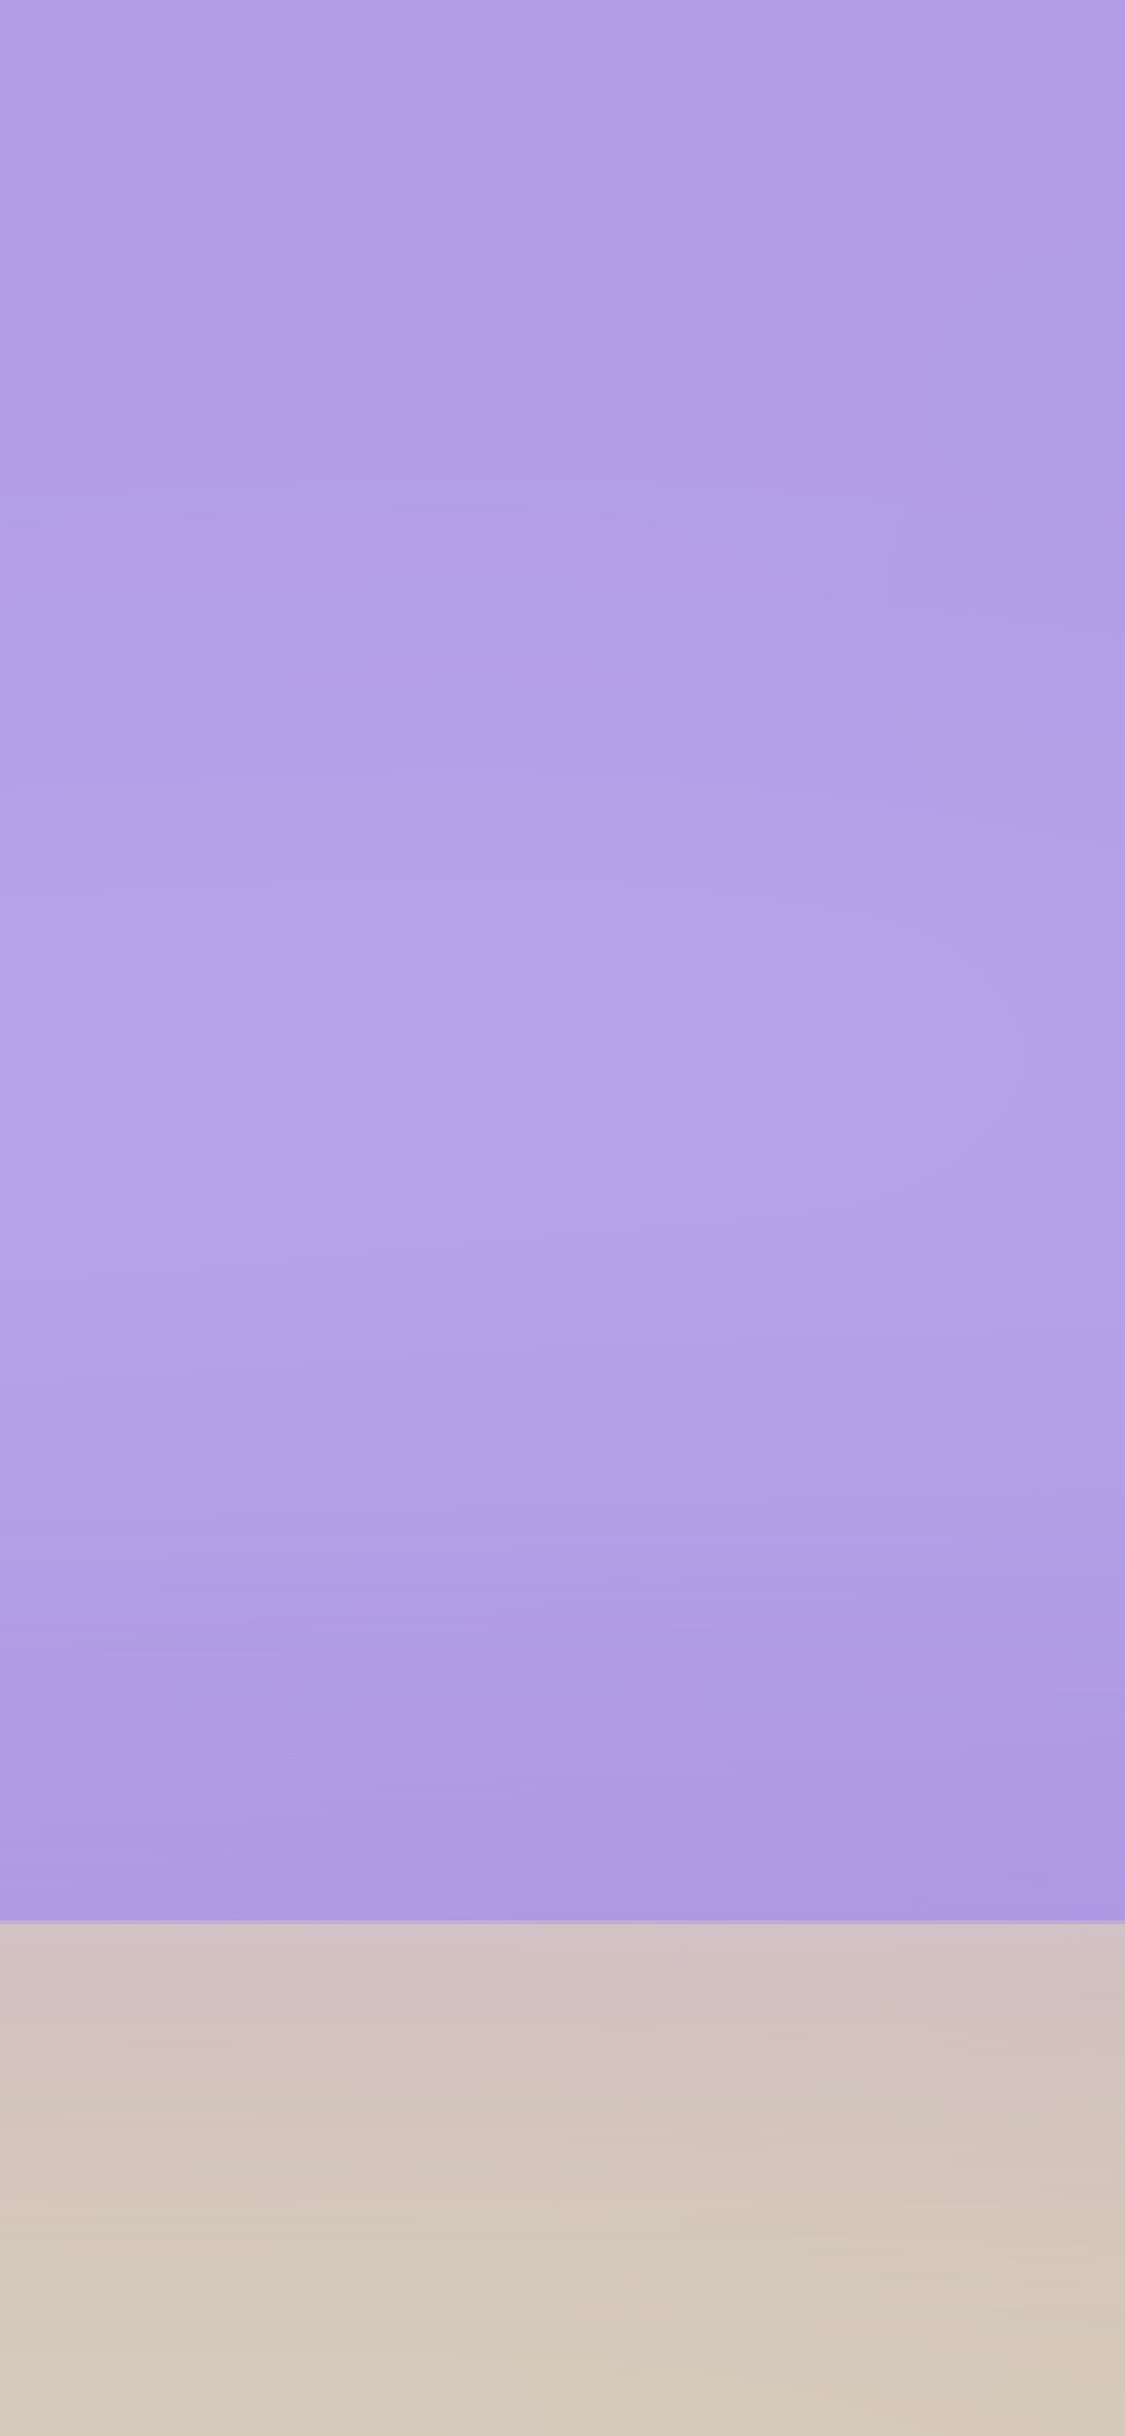 iPhonexpapers.com-Apple-iPhone-wallpaper-sn34-flat-colorlovers-purple-blur-gradation-pastel